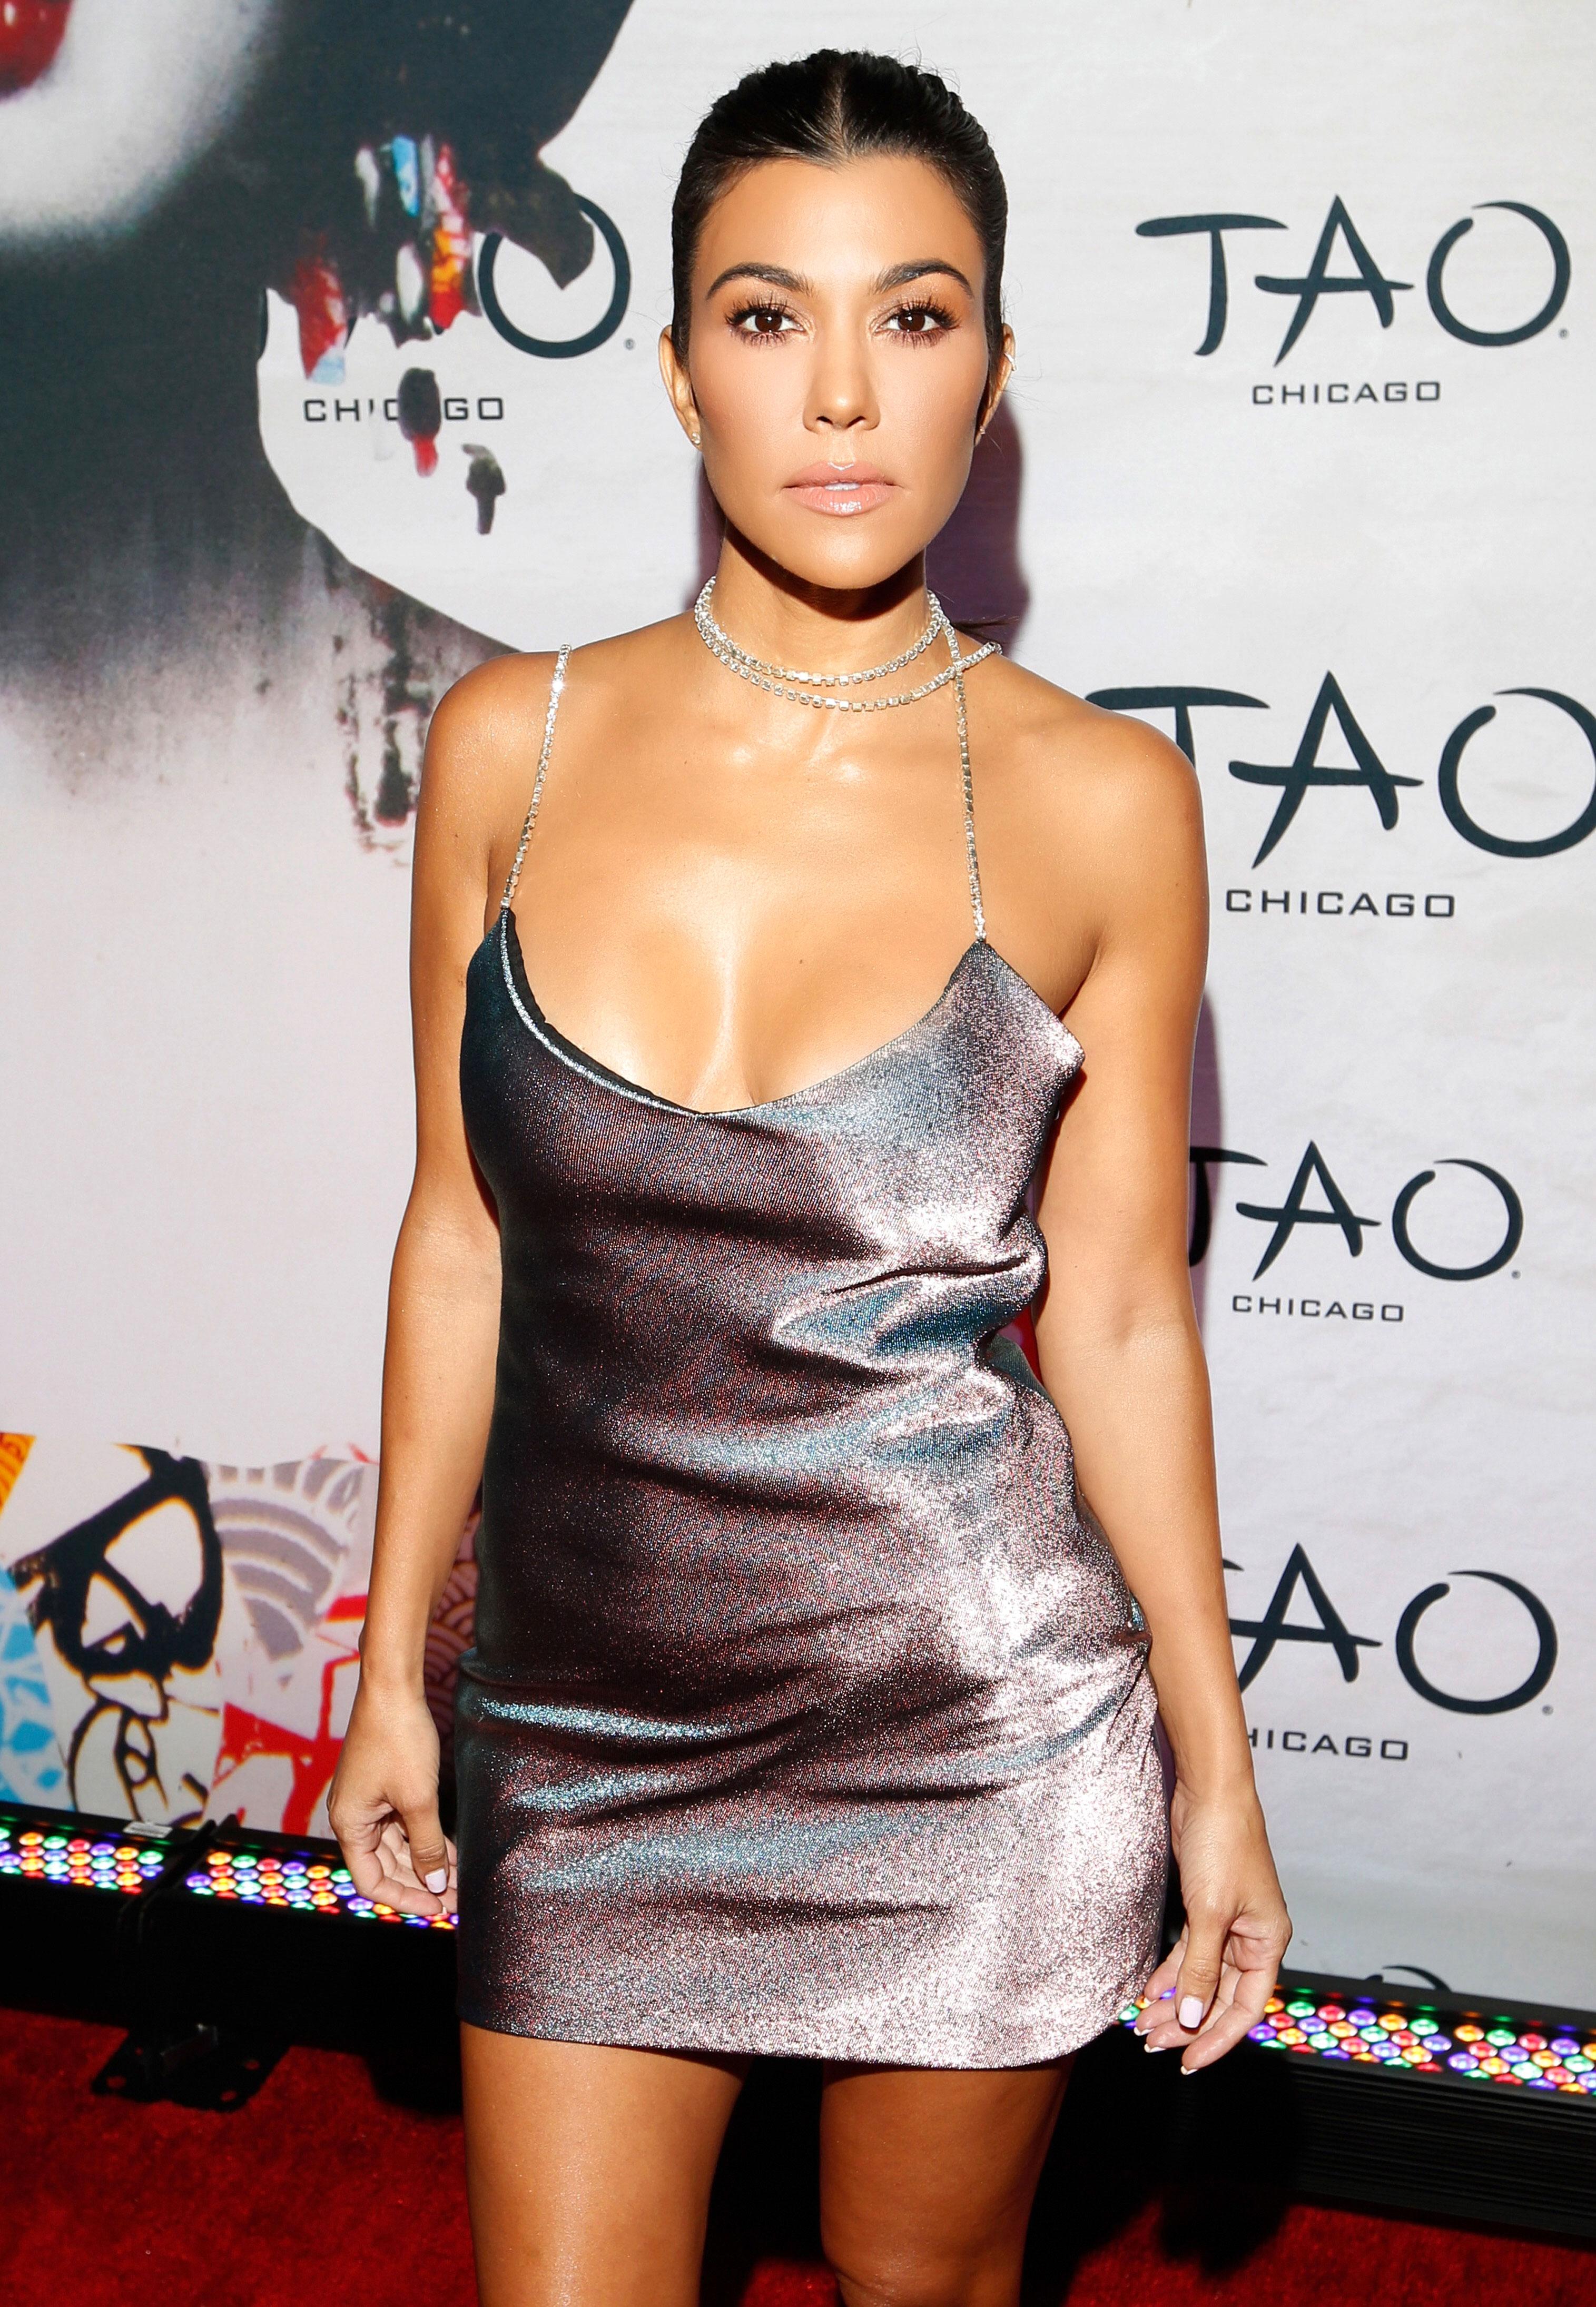 Kourtney Kardashian Bans Plastic Water Bottles in Her House: 'No More' - Kourtney Kardashian attends the TAO Chicago Grand Opening Celebration at TAO Chicago on September 15, 2018 in Chicago, Illinois.